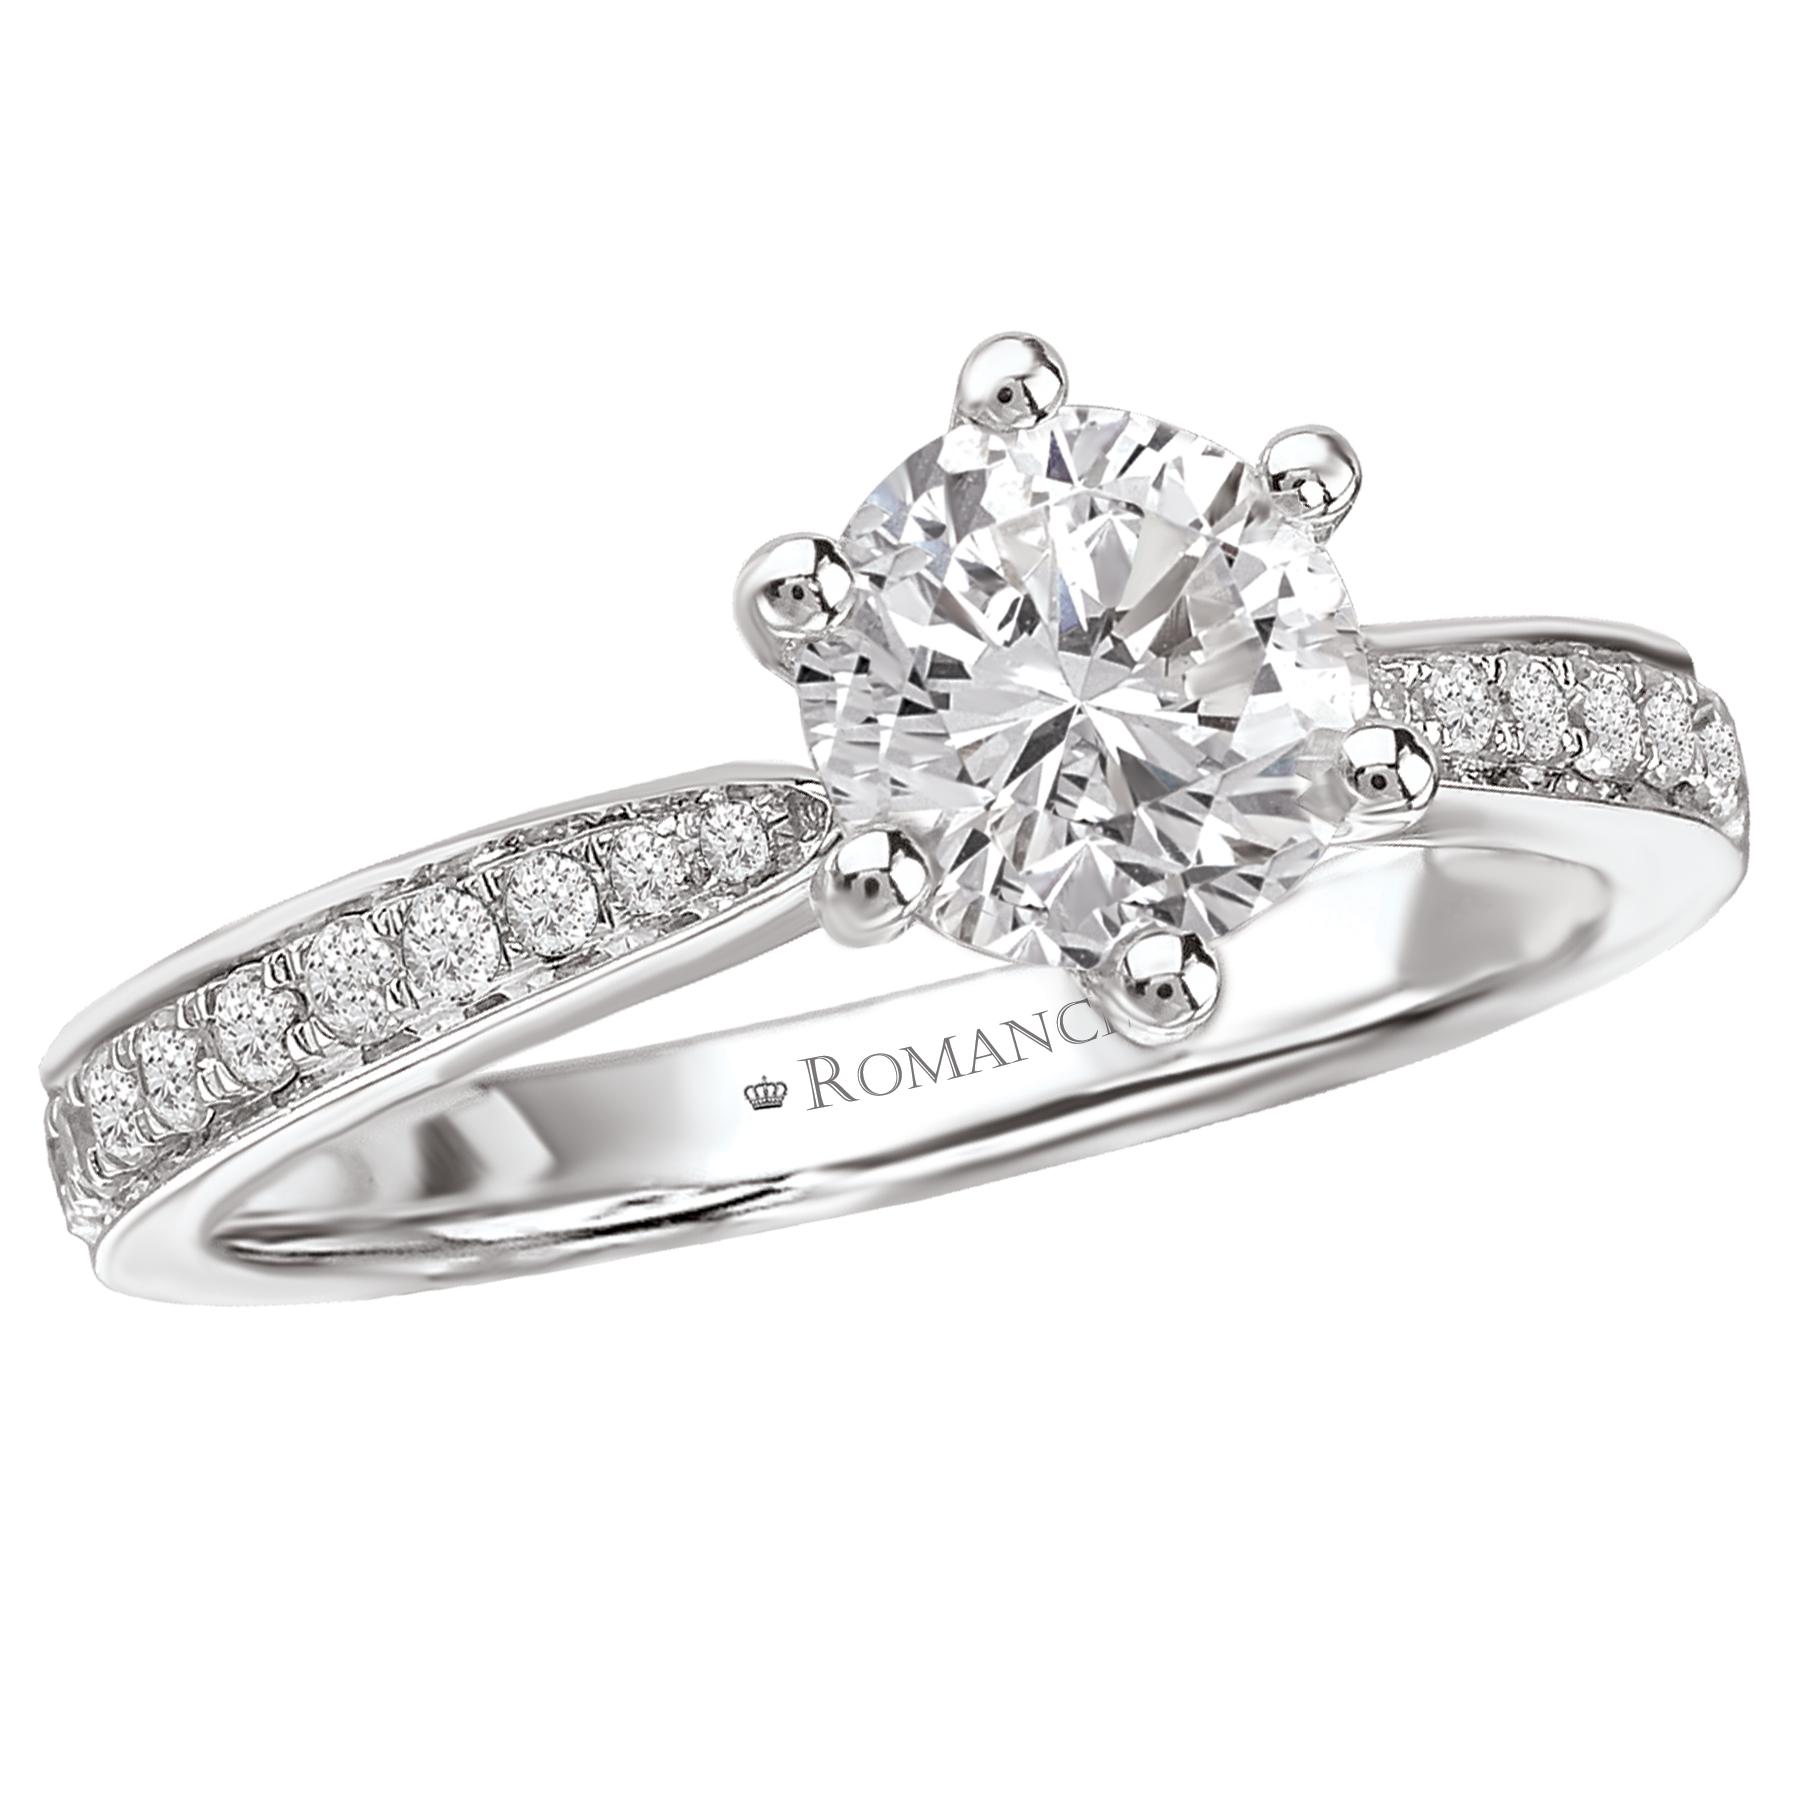 Engagement Rings York: Engagement Rings 117102-100